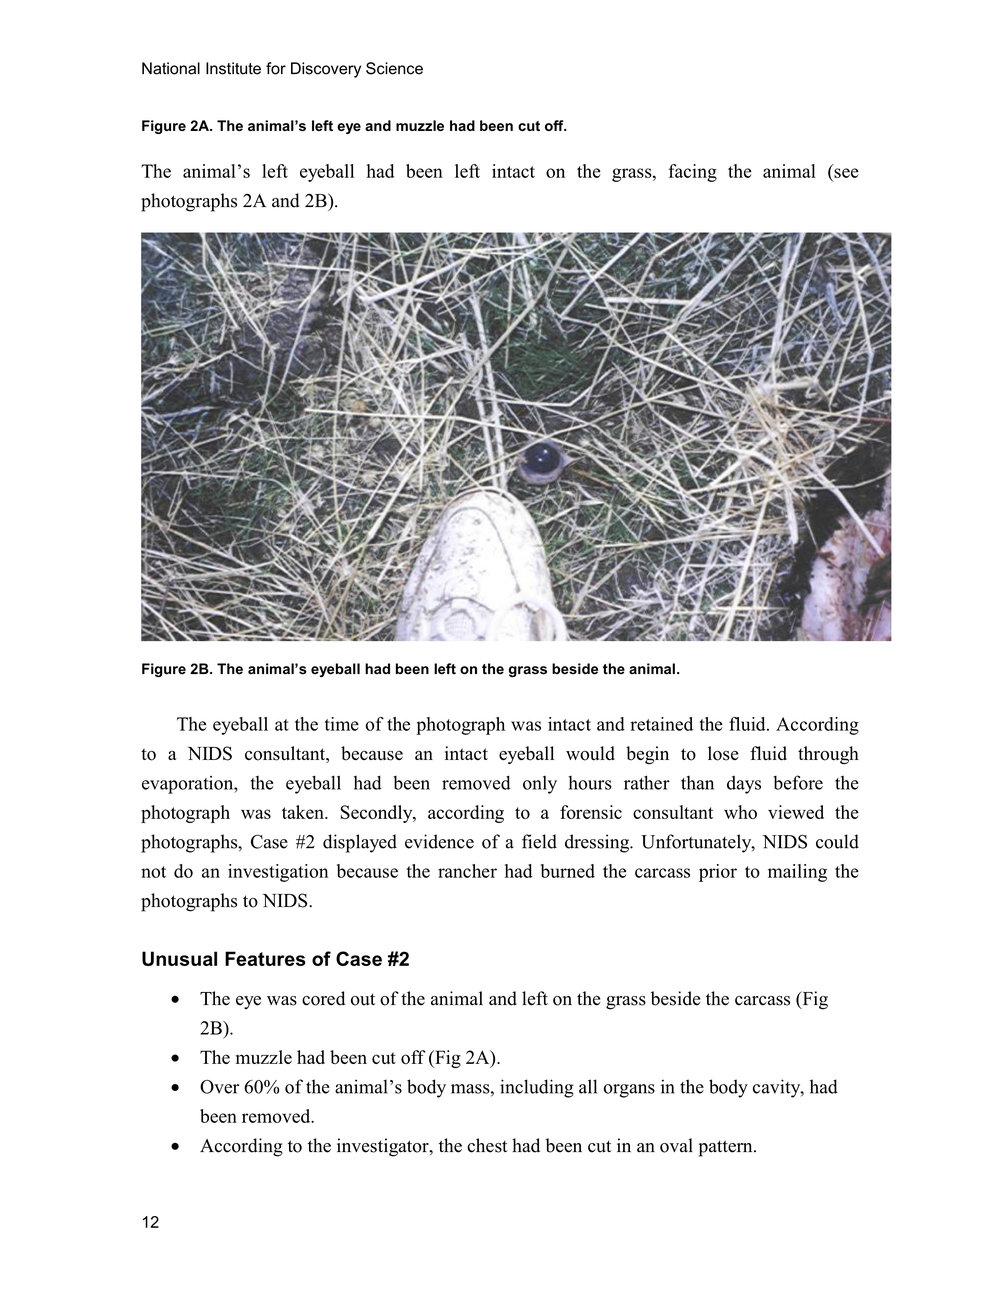 1997 ANIMAL MUTILATION REPORT 11.jpg